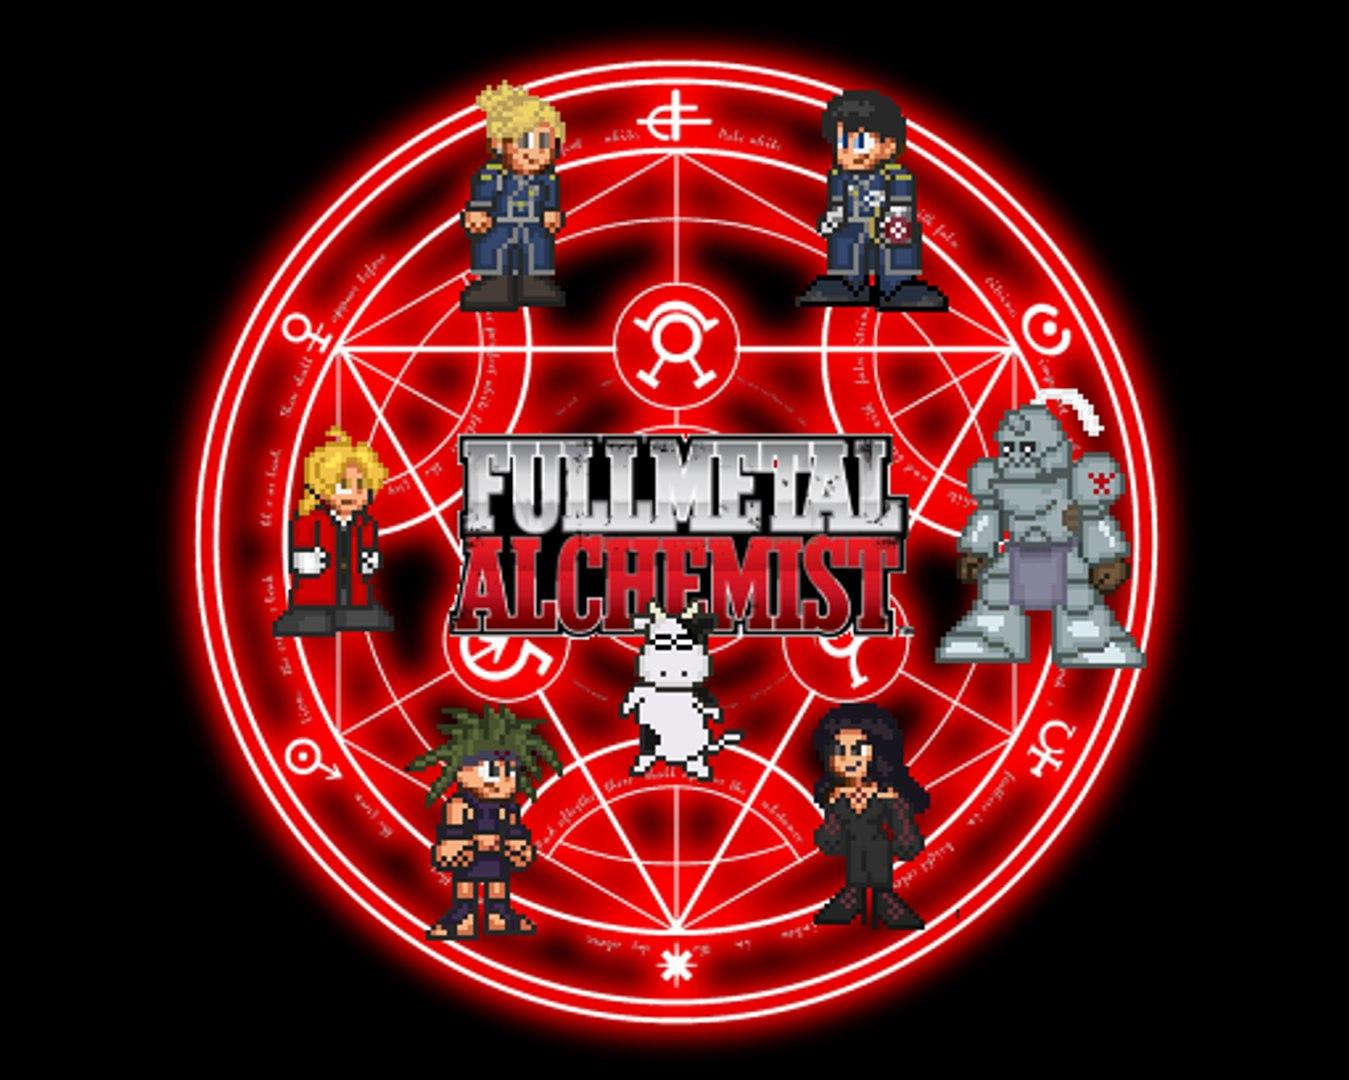 Full Metal Alchemist Pdf Fr otaku evolution episode 1 - fullmetal alchemist (part 1)